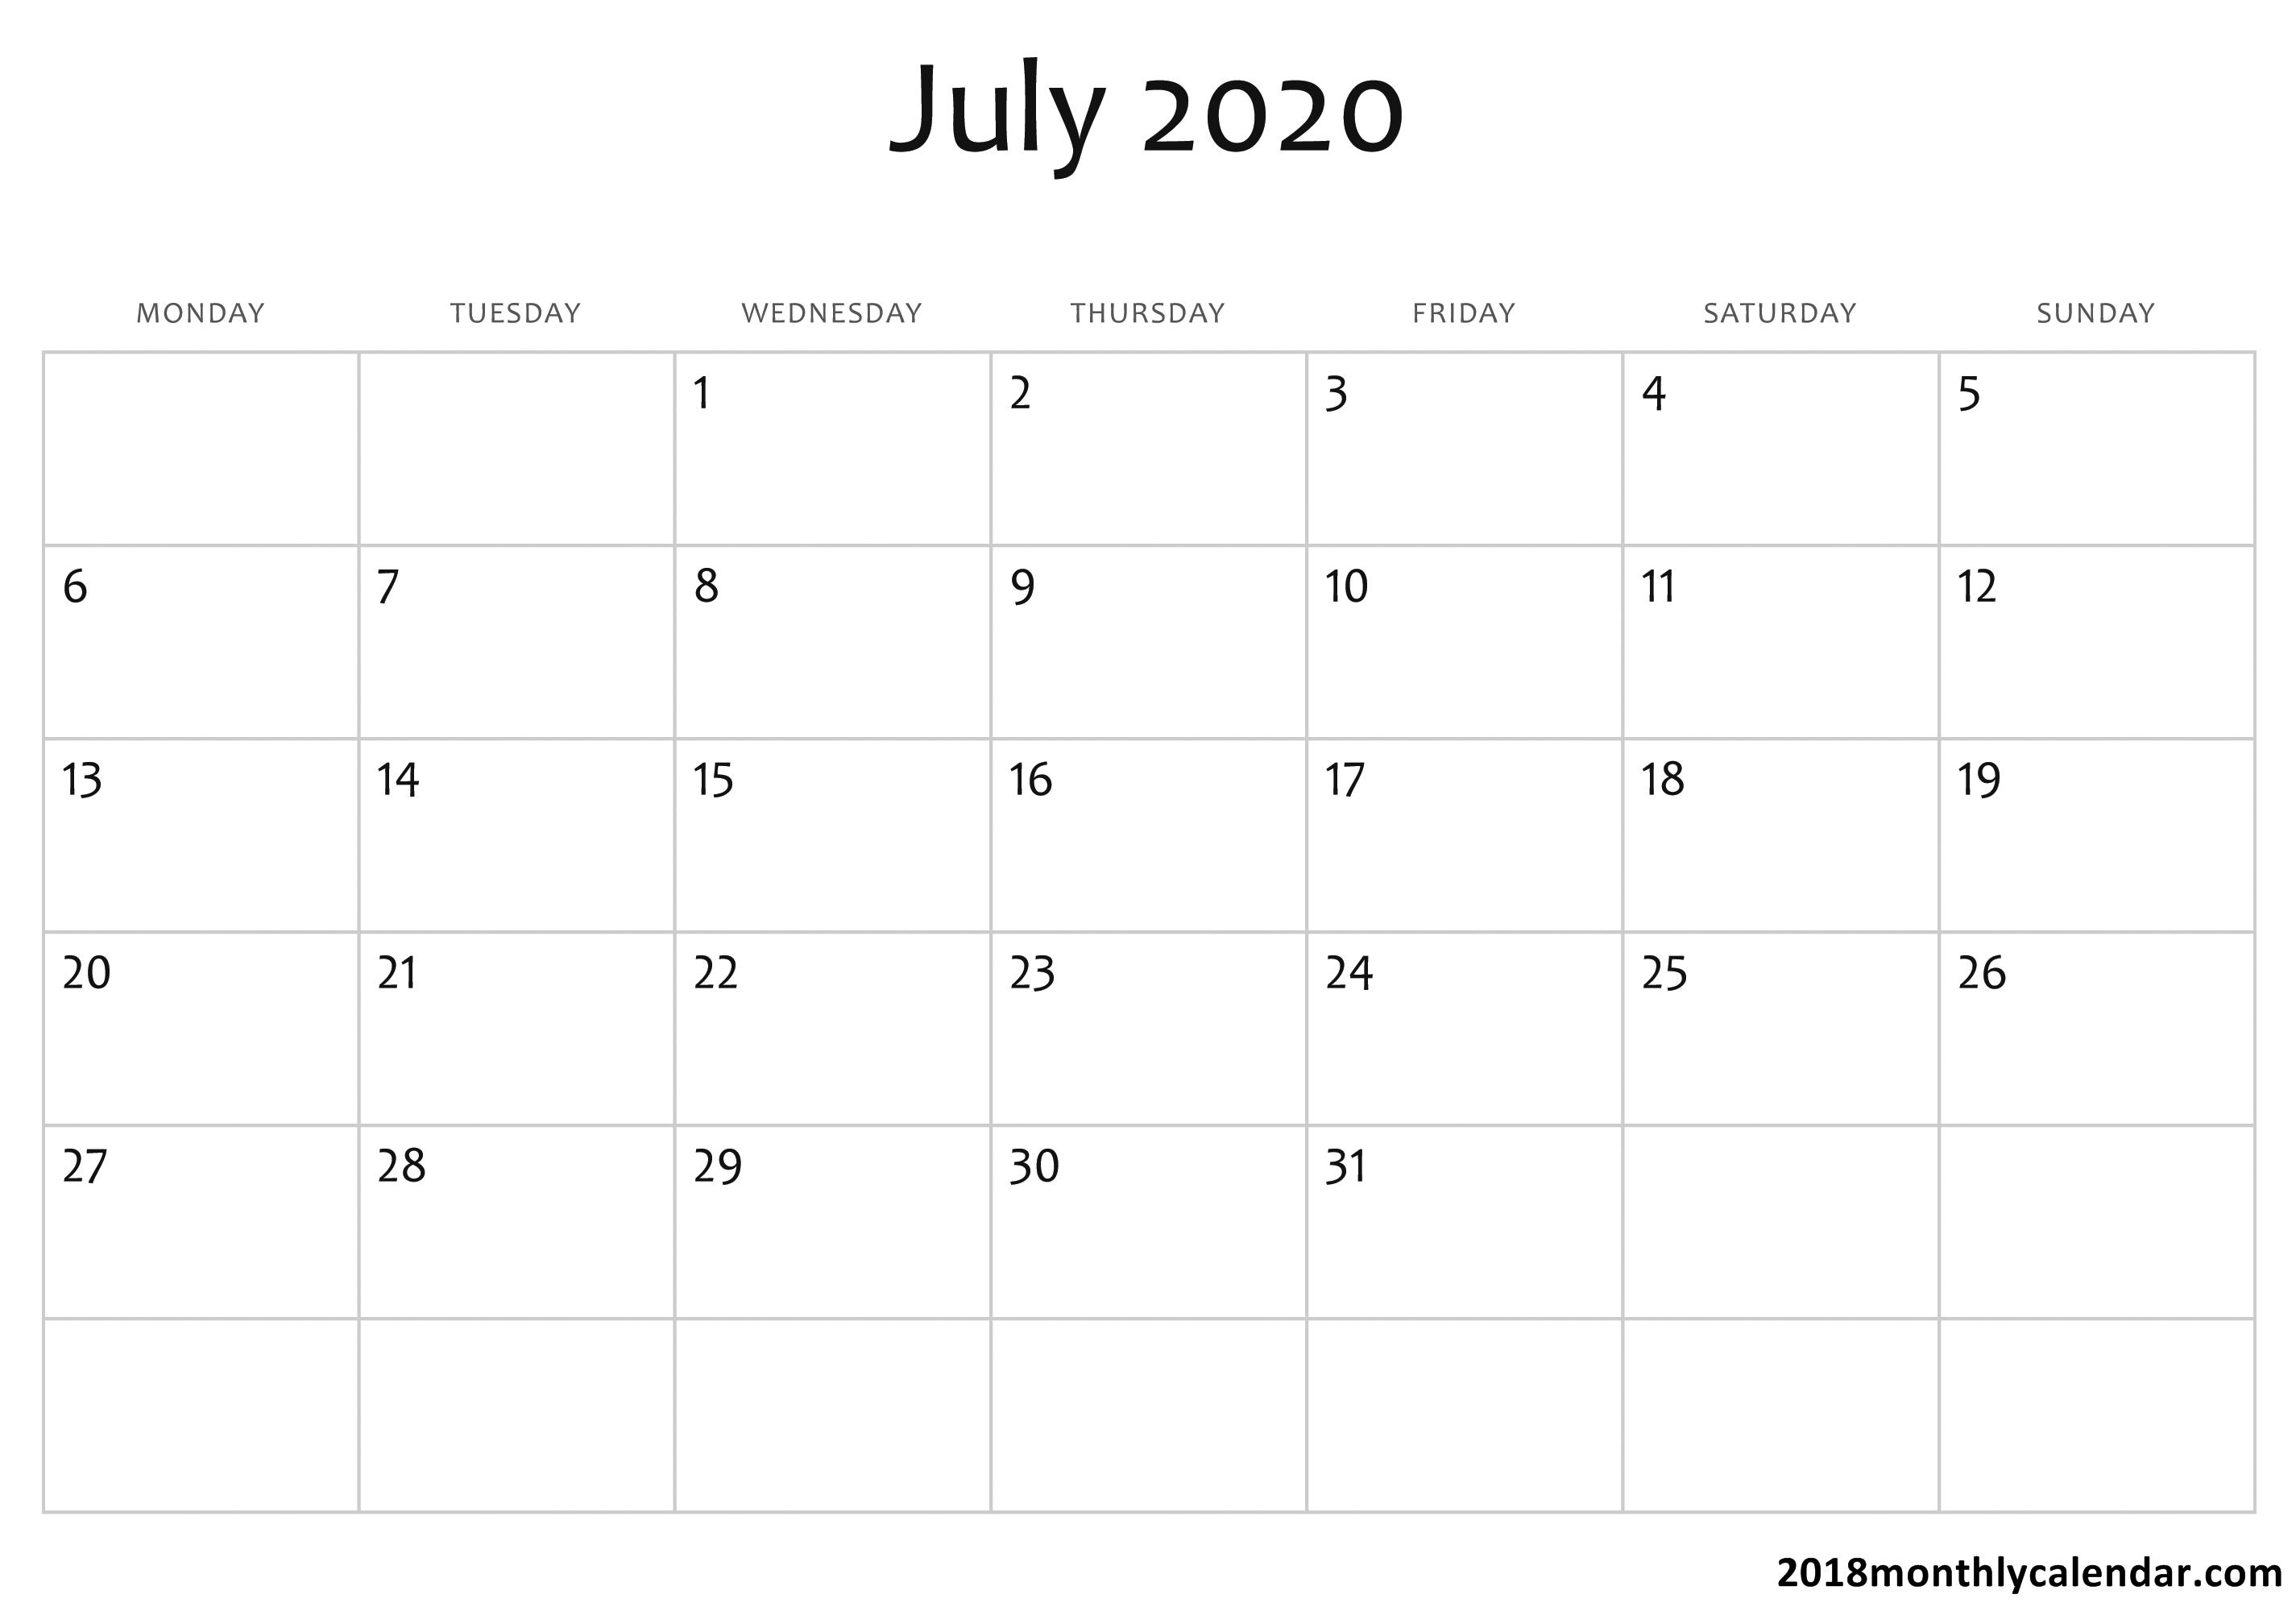 Download July 2020 Calendar – Blank & Editable inside 2020 Calender I Can Edit